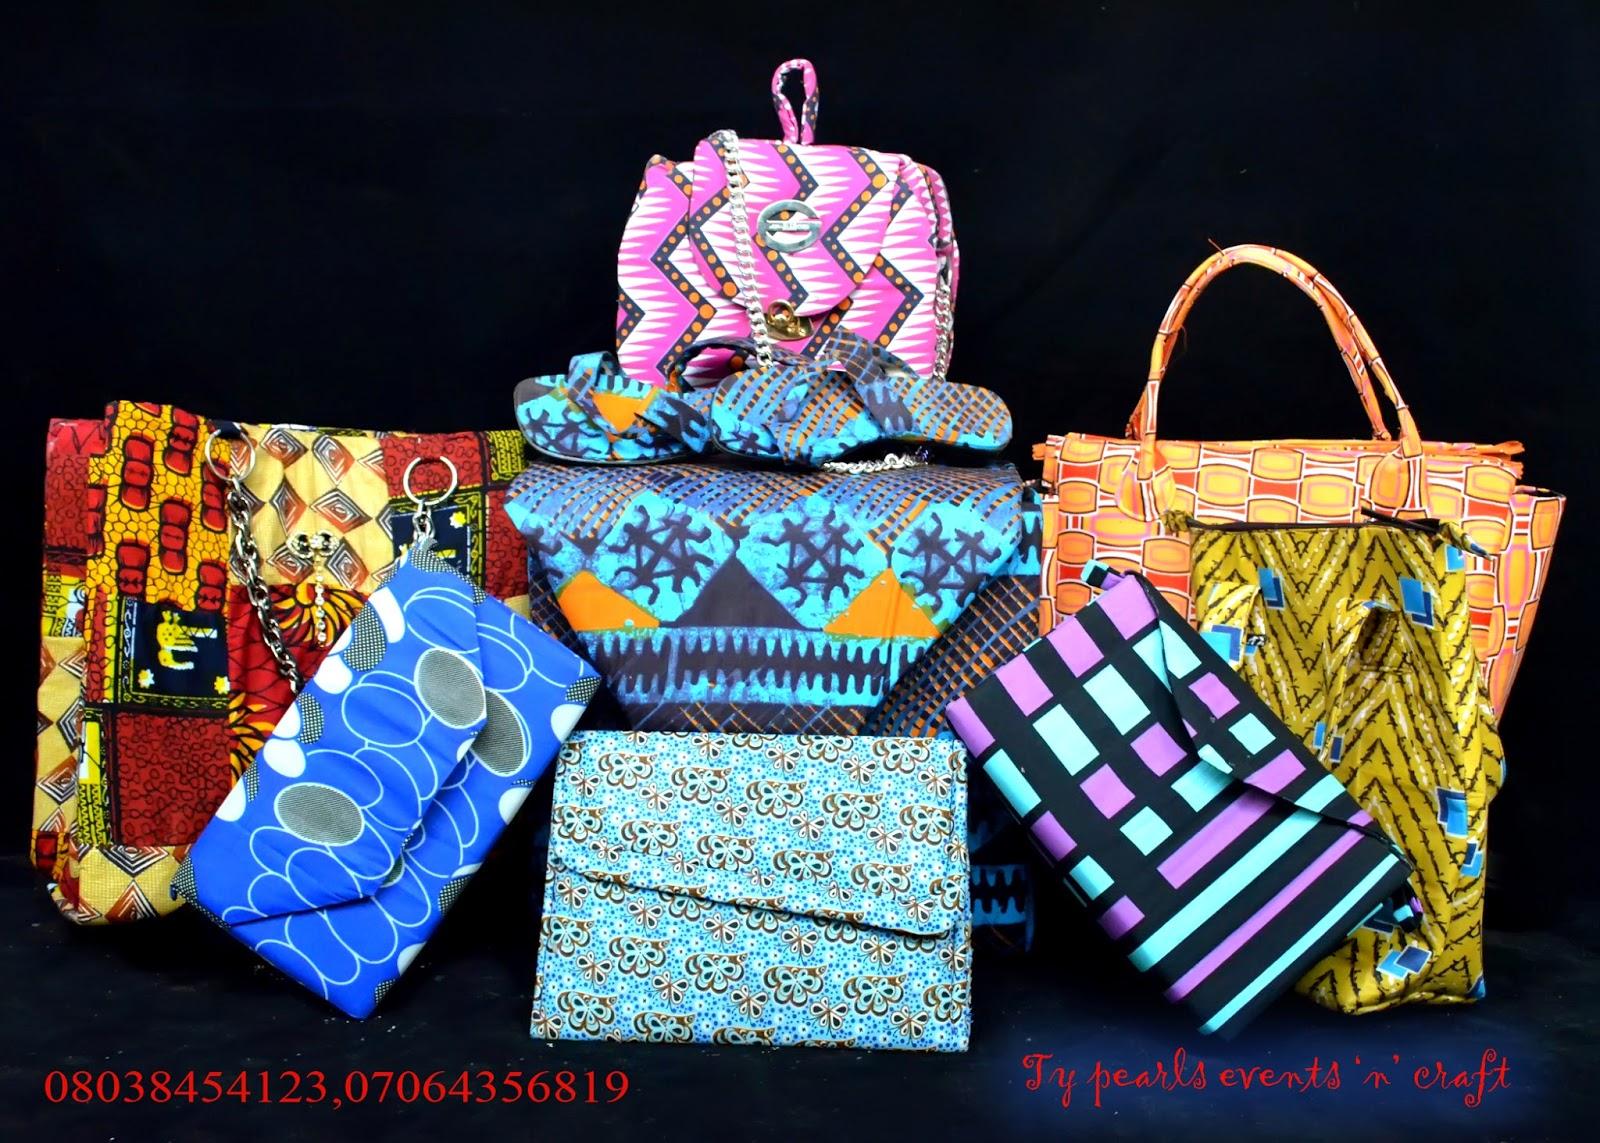 Ankara crafts-typearls